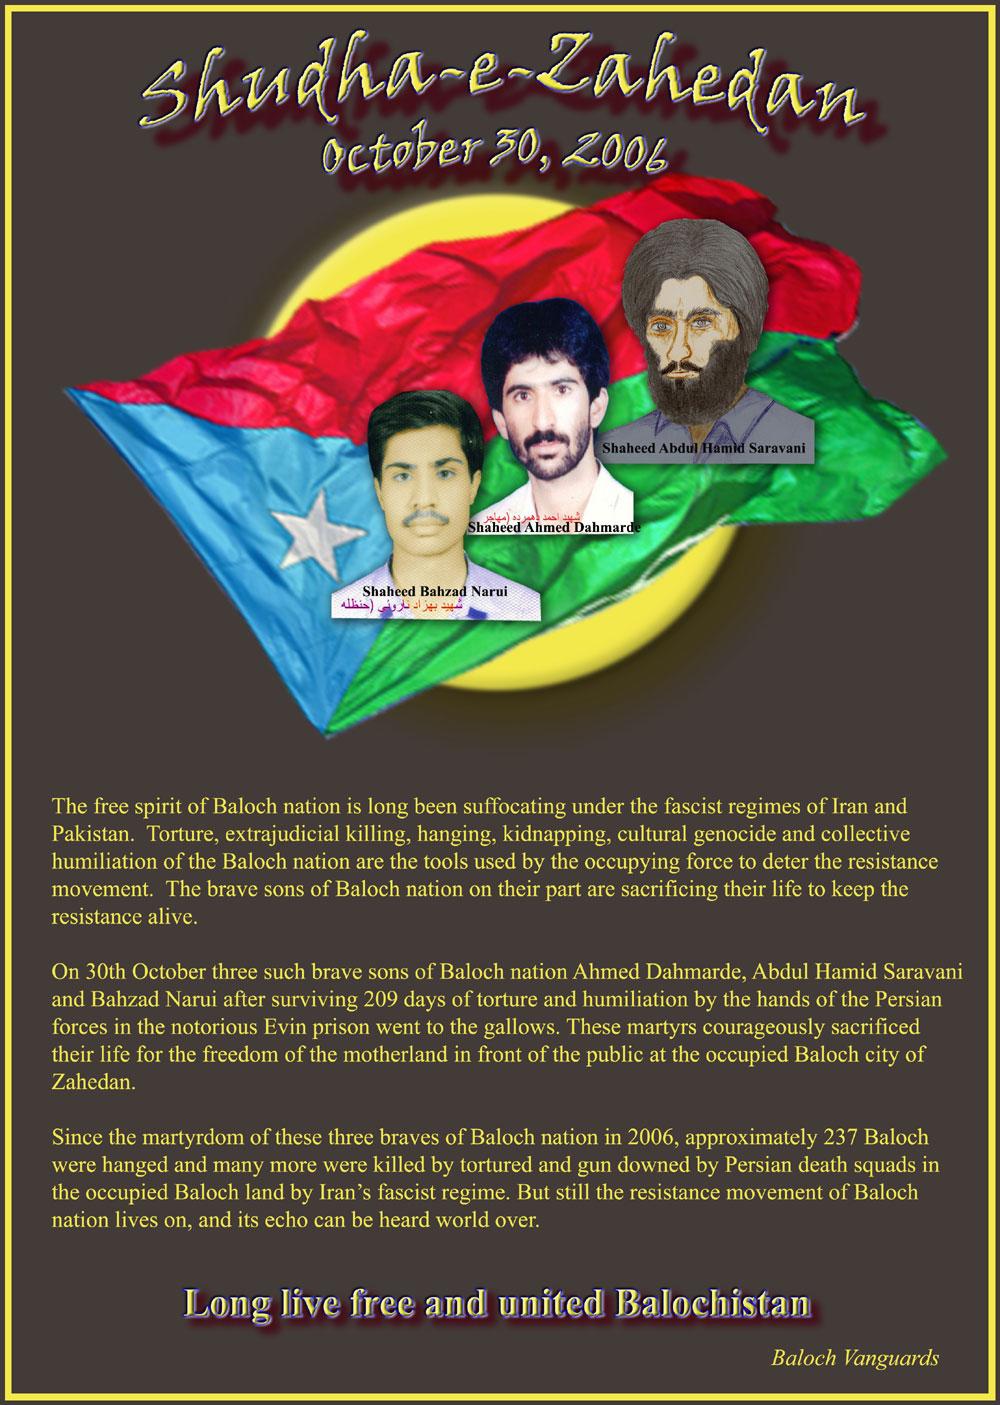 http://baluchsarmachar.files.wordpress.com/2009/05/poster-shudaha-e-zahedan.jpg